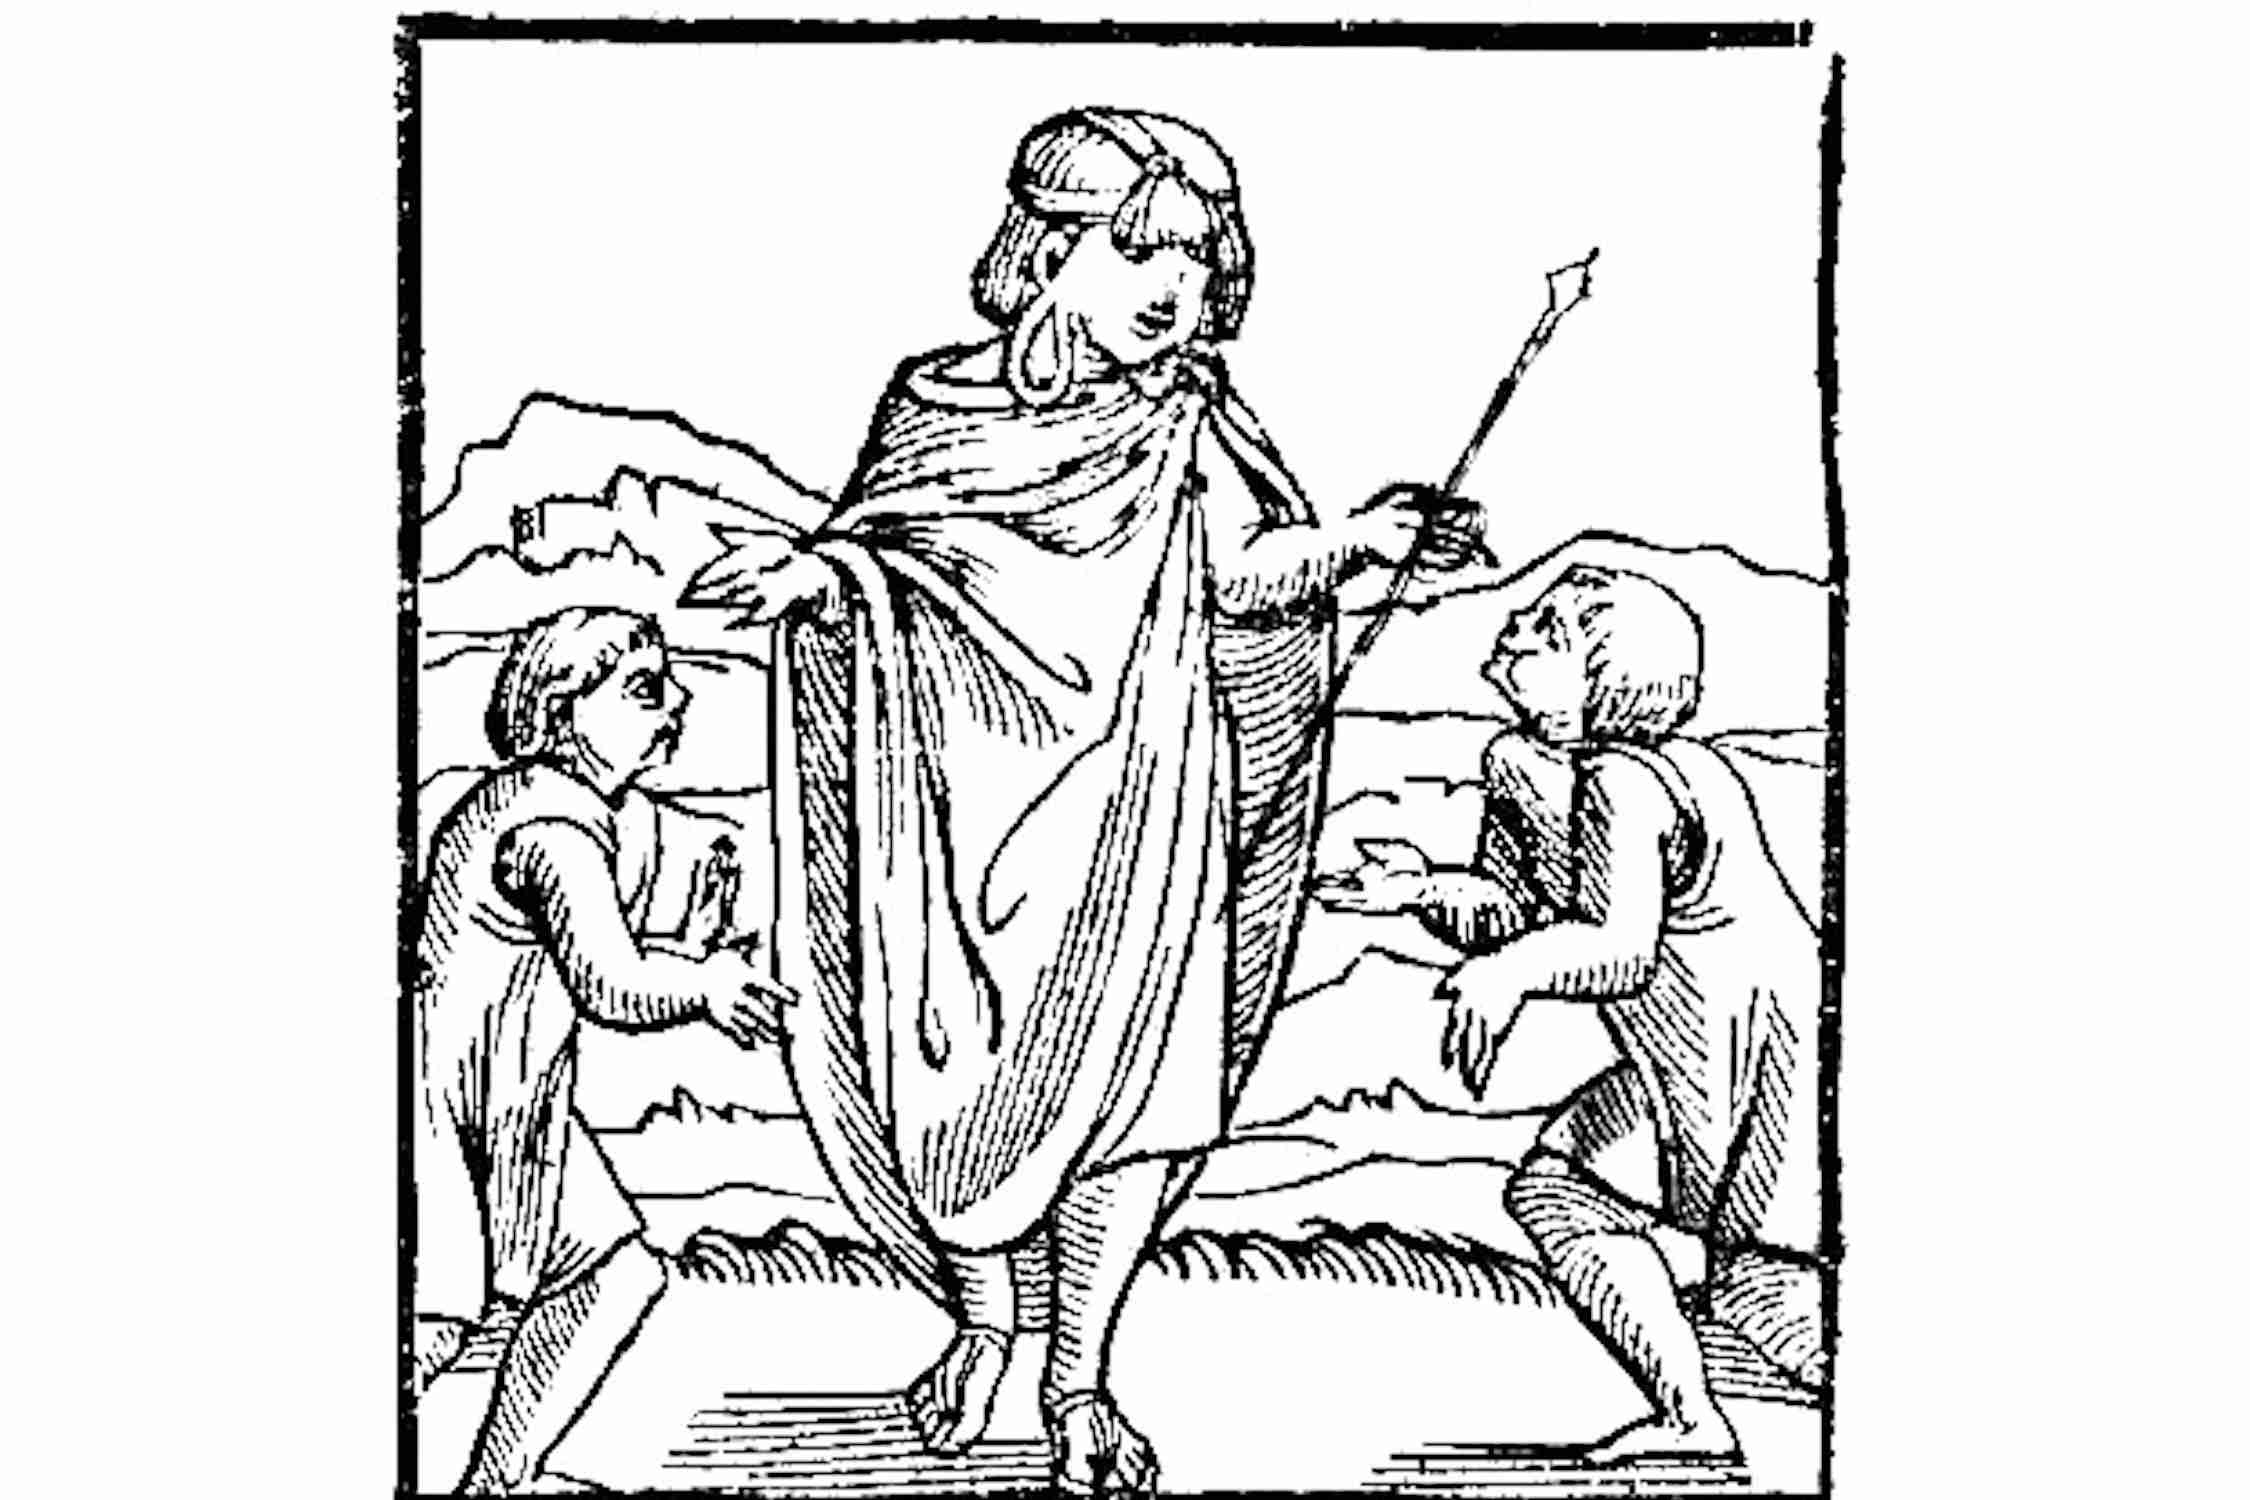 The first image of the Inca in Europe, Pedro Cieza de León, Cronica del Peru, 1553